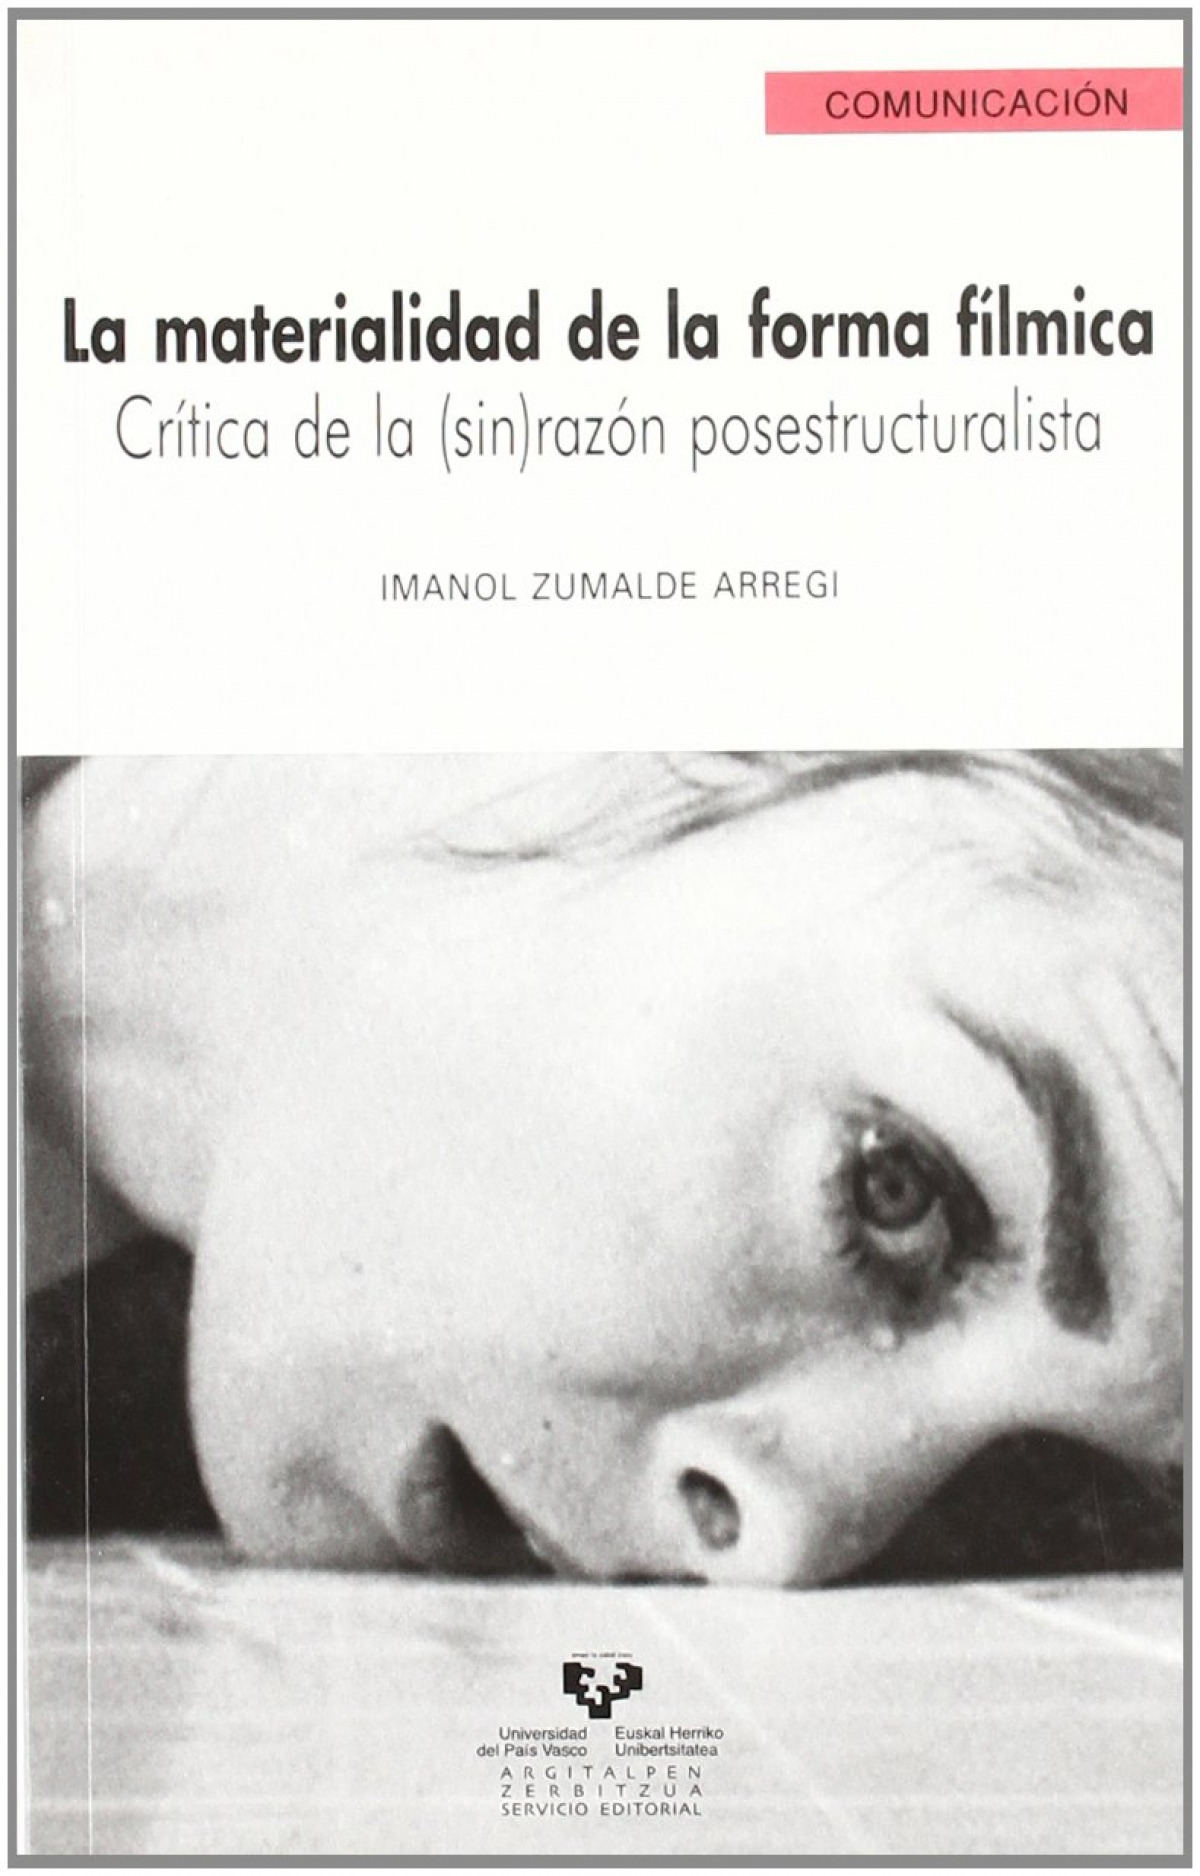 La materialidad de la forma fílmica. Crítica de la (sin)razó - Zumalde Arregi, Imanol